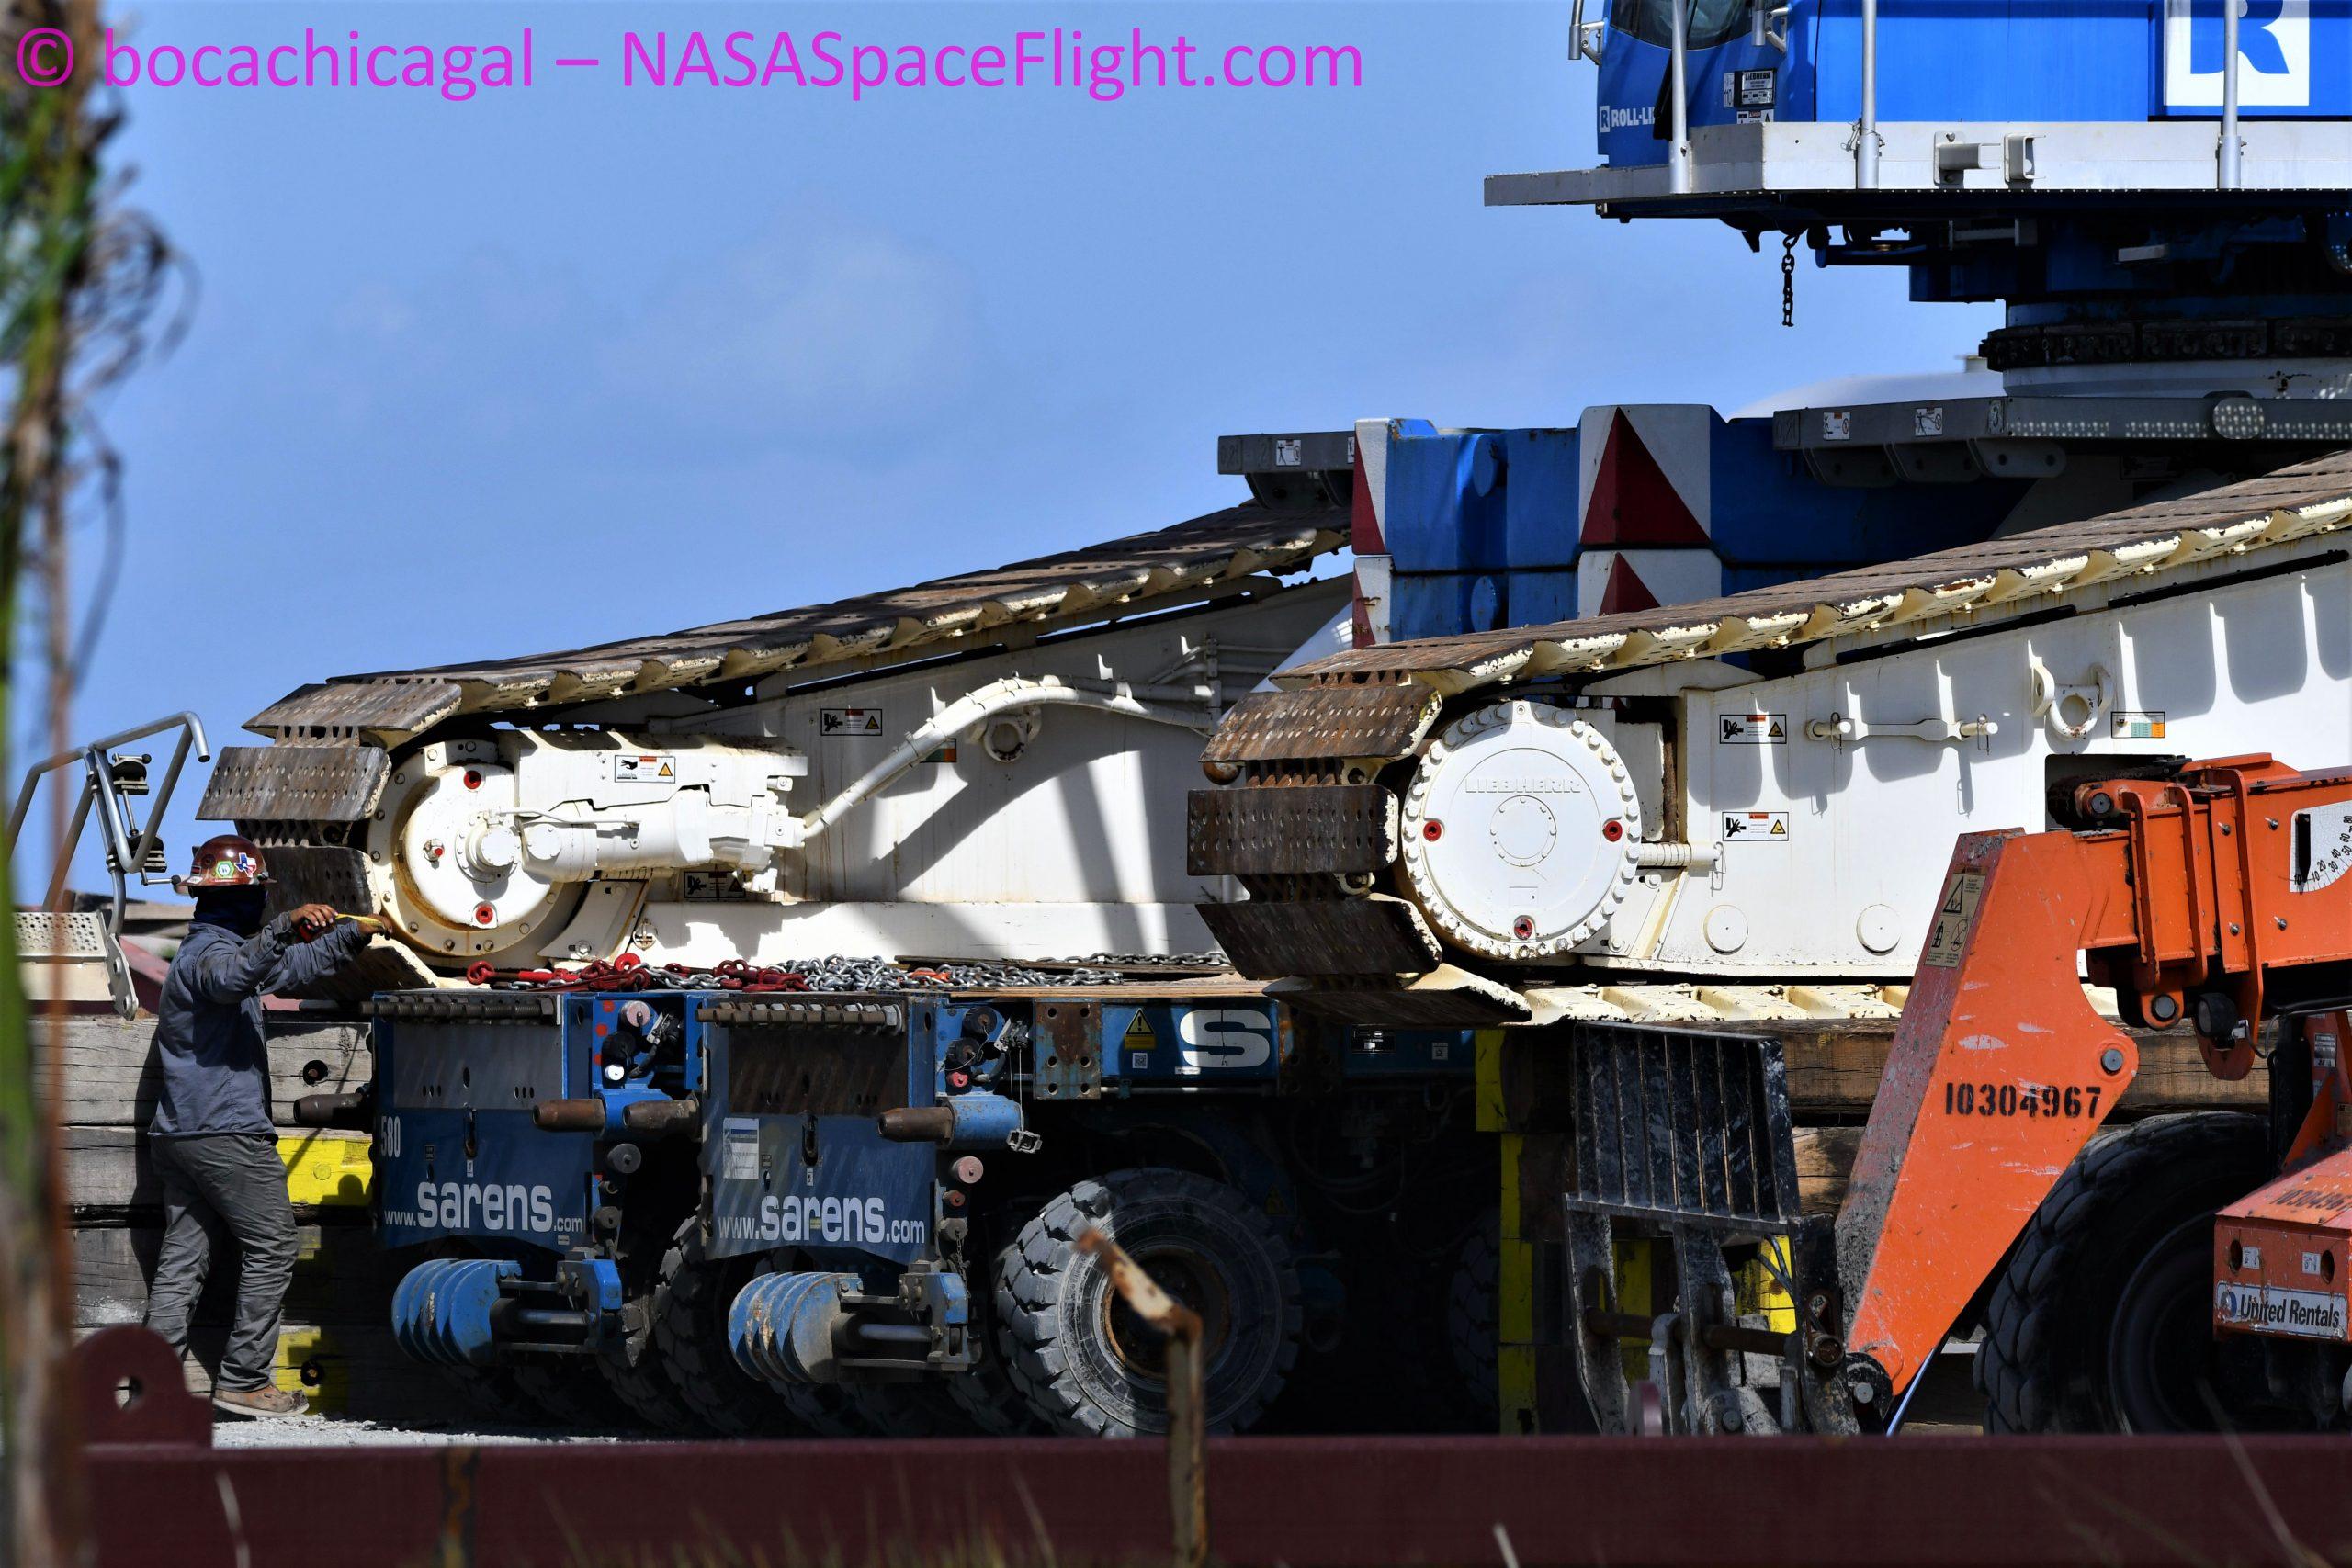 Starship Boca Chica 102020 (NASASpaceflight – bocachicagal) new crane 1